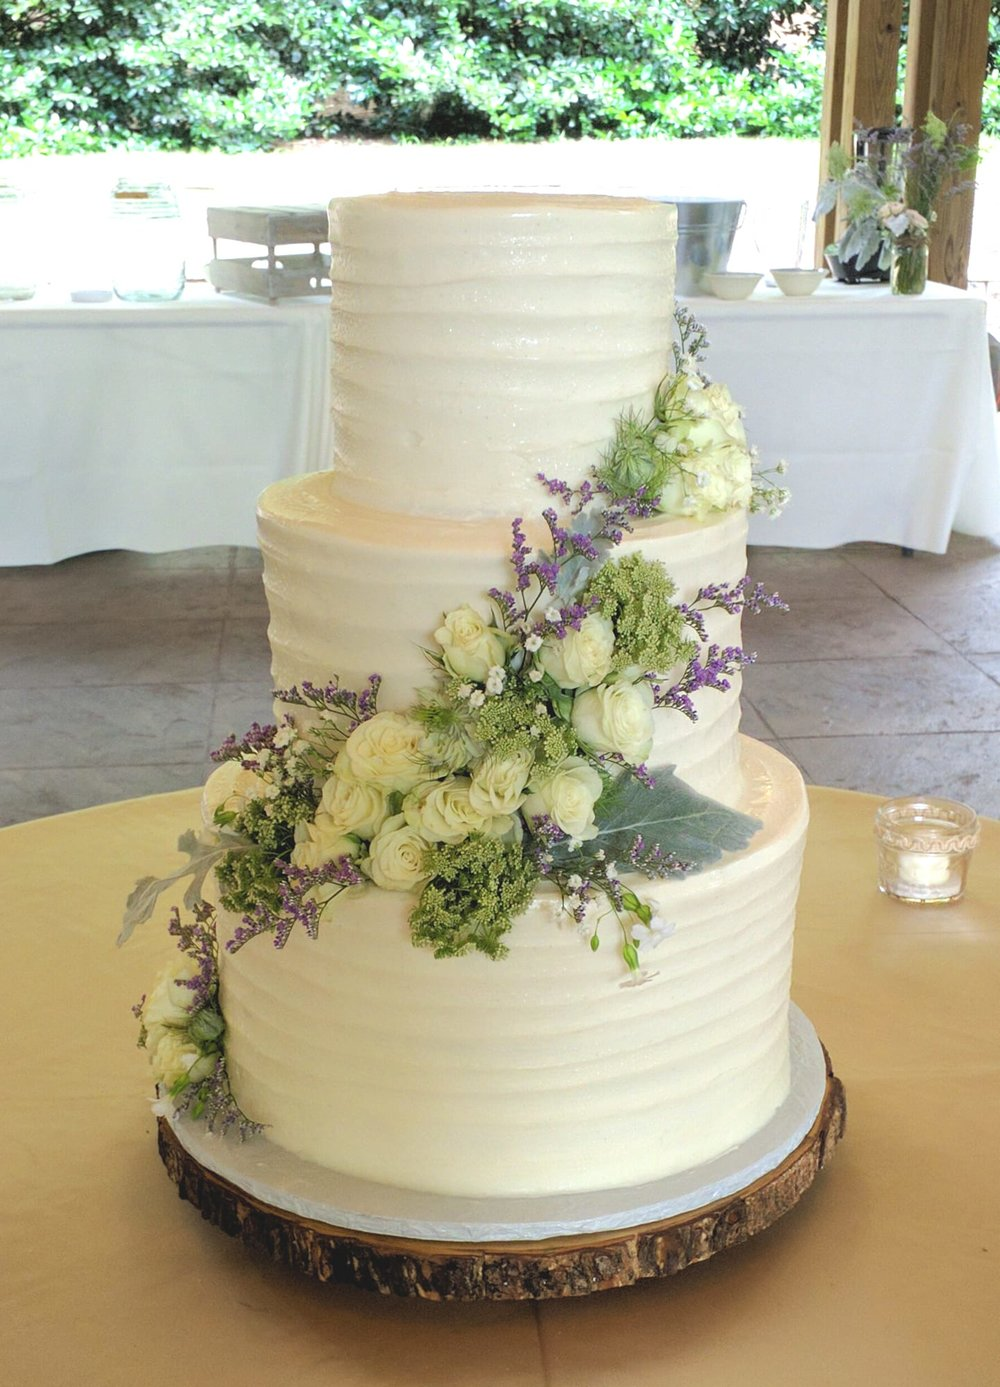 brides-cake-2.jpg